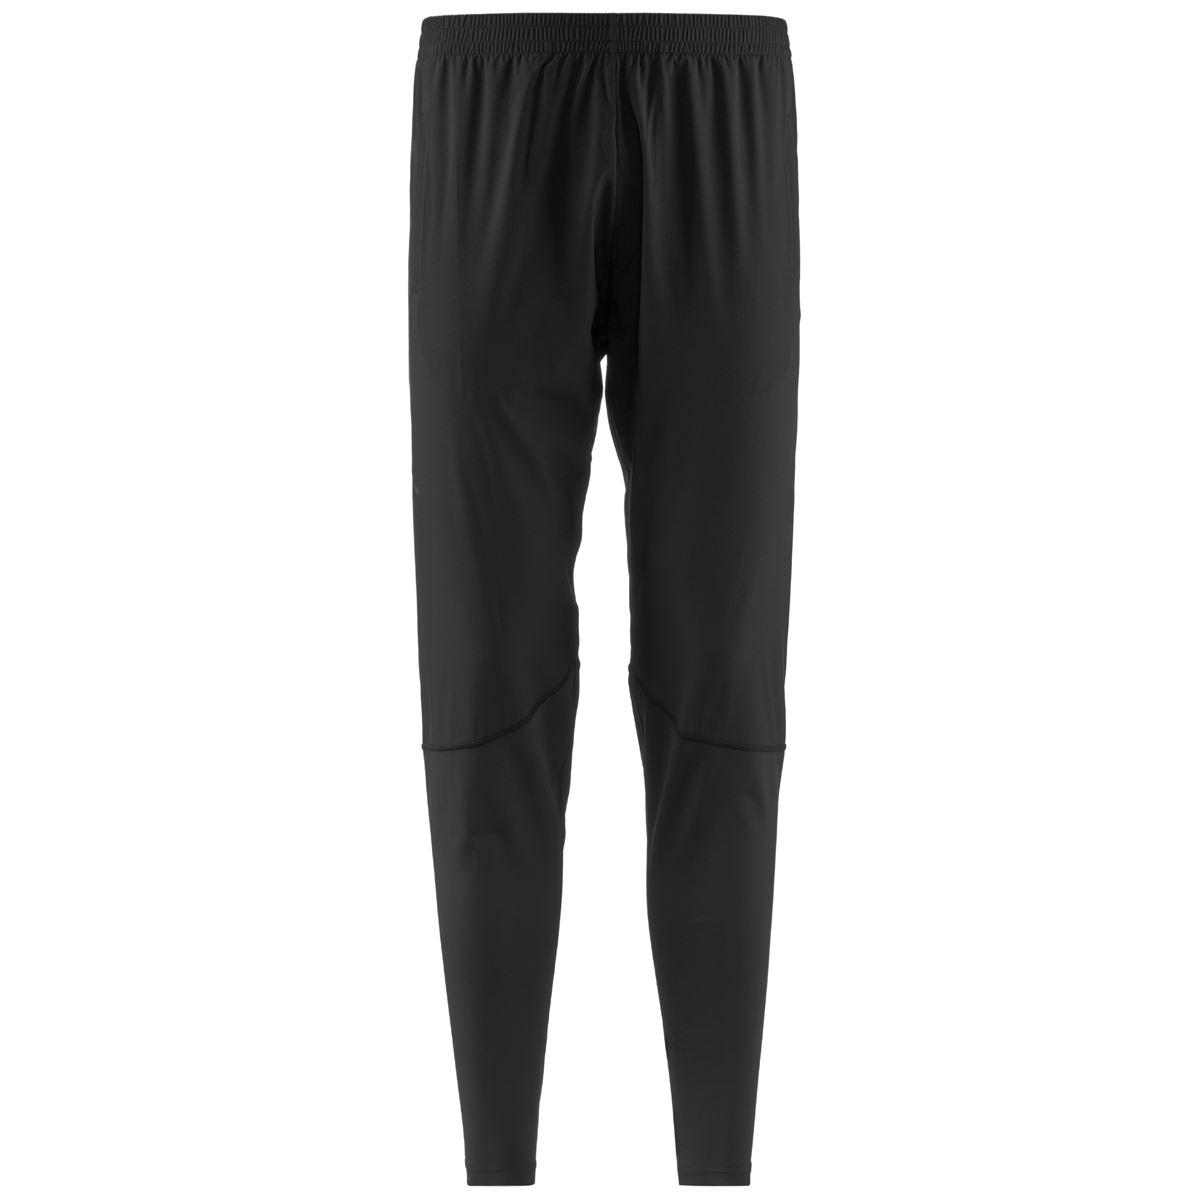 Kappa Pantaloni uomo-304VH30